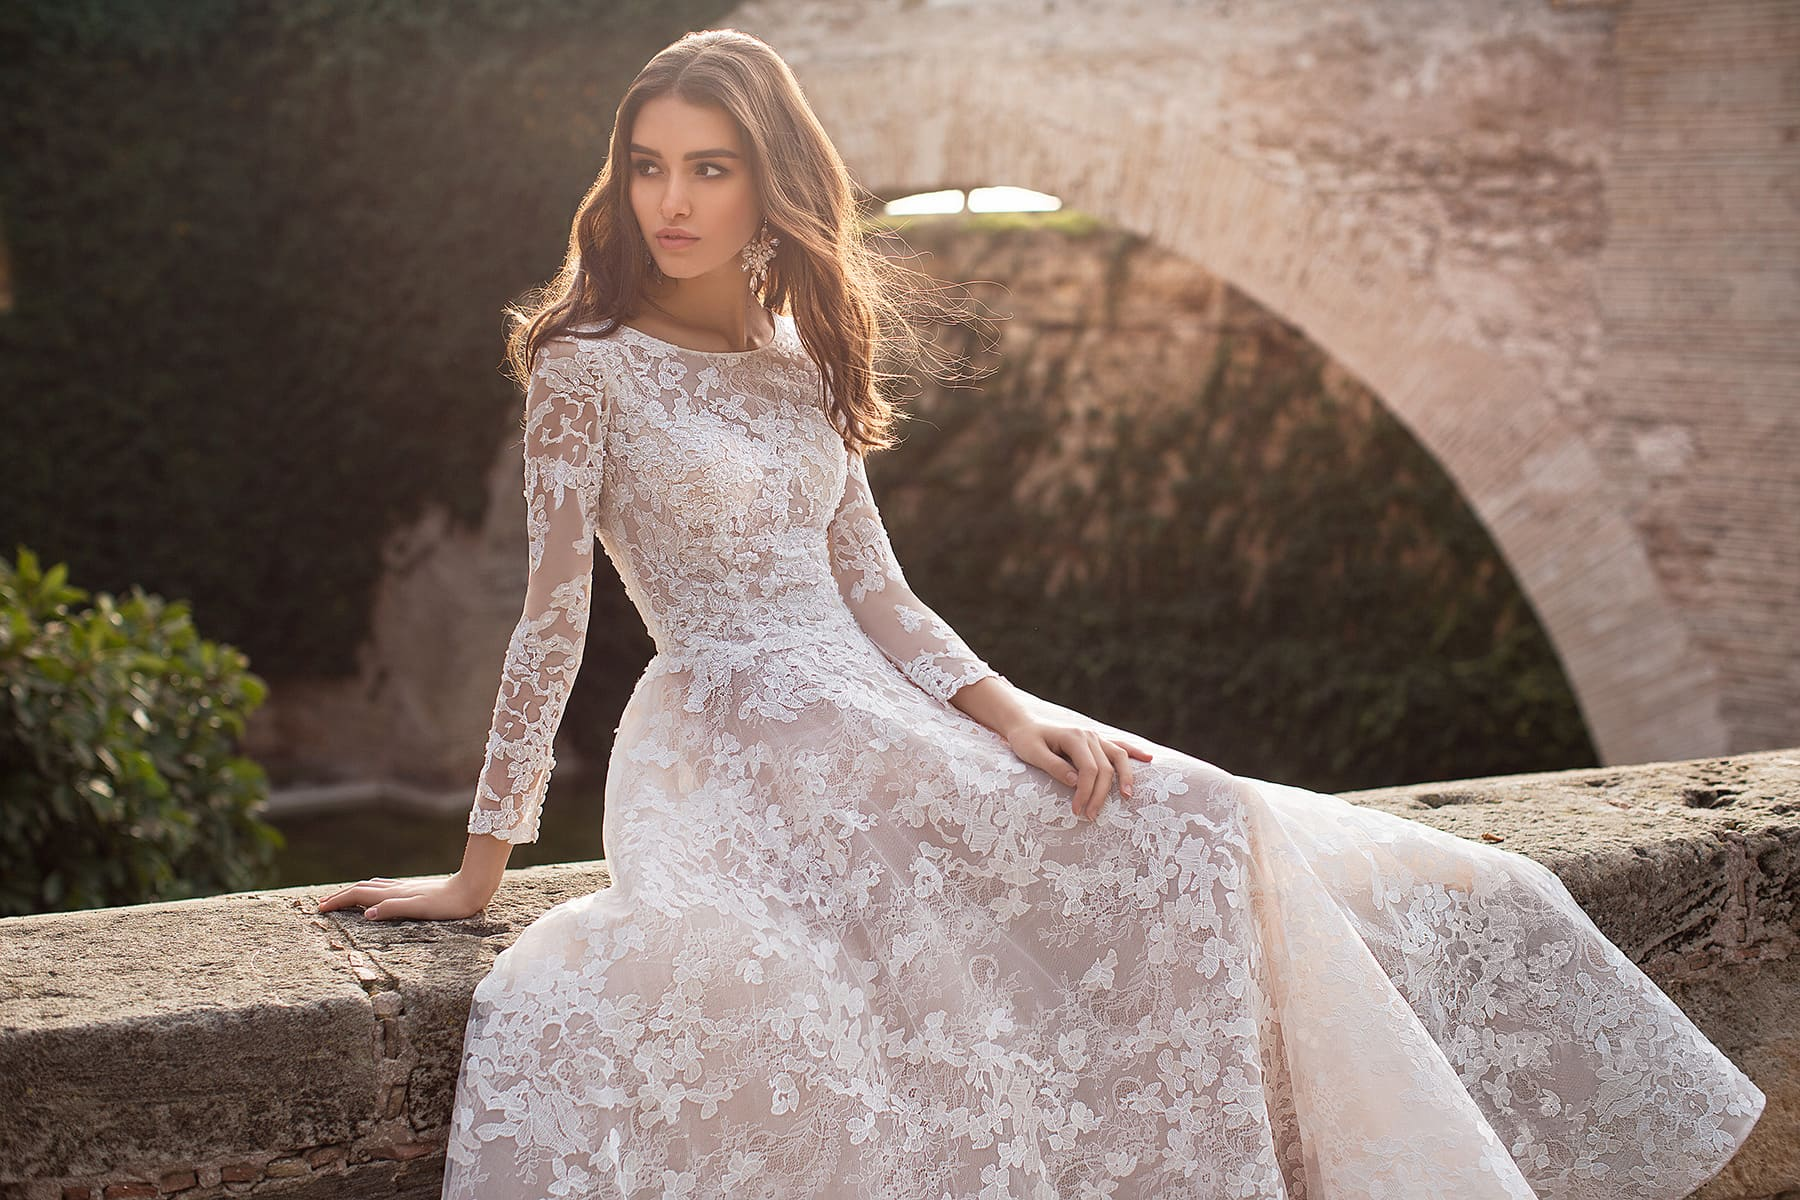 733a91727e09e0 Свадебное платье Naviblue Bridal Julya. 🔍. Кружевное свадебное платье  цвета айвори с длинным рукавом. /shop/jully/ /shop/lally/